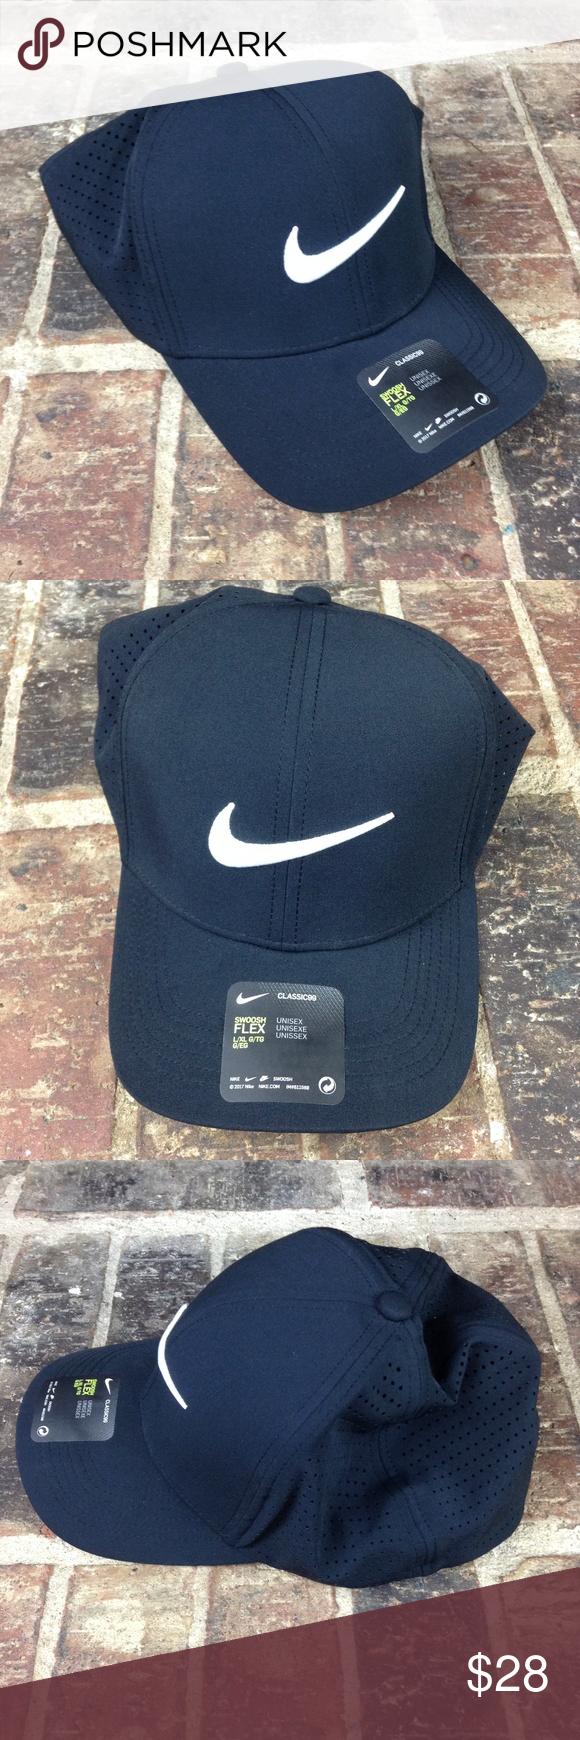 7840aee511b35 Nike Golf Classic 99 Performance Stretch Fit Hat C Nike Golf Classic 99  Performance Stretch Fit